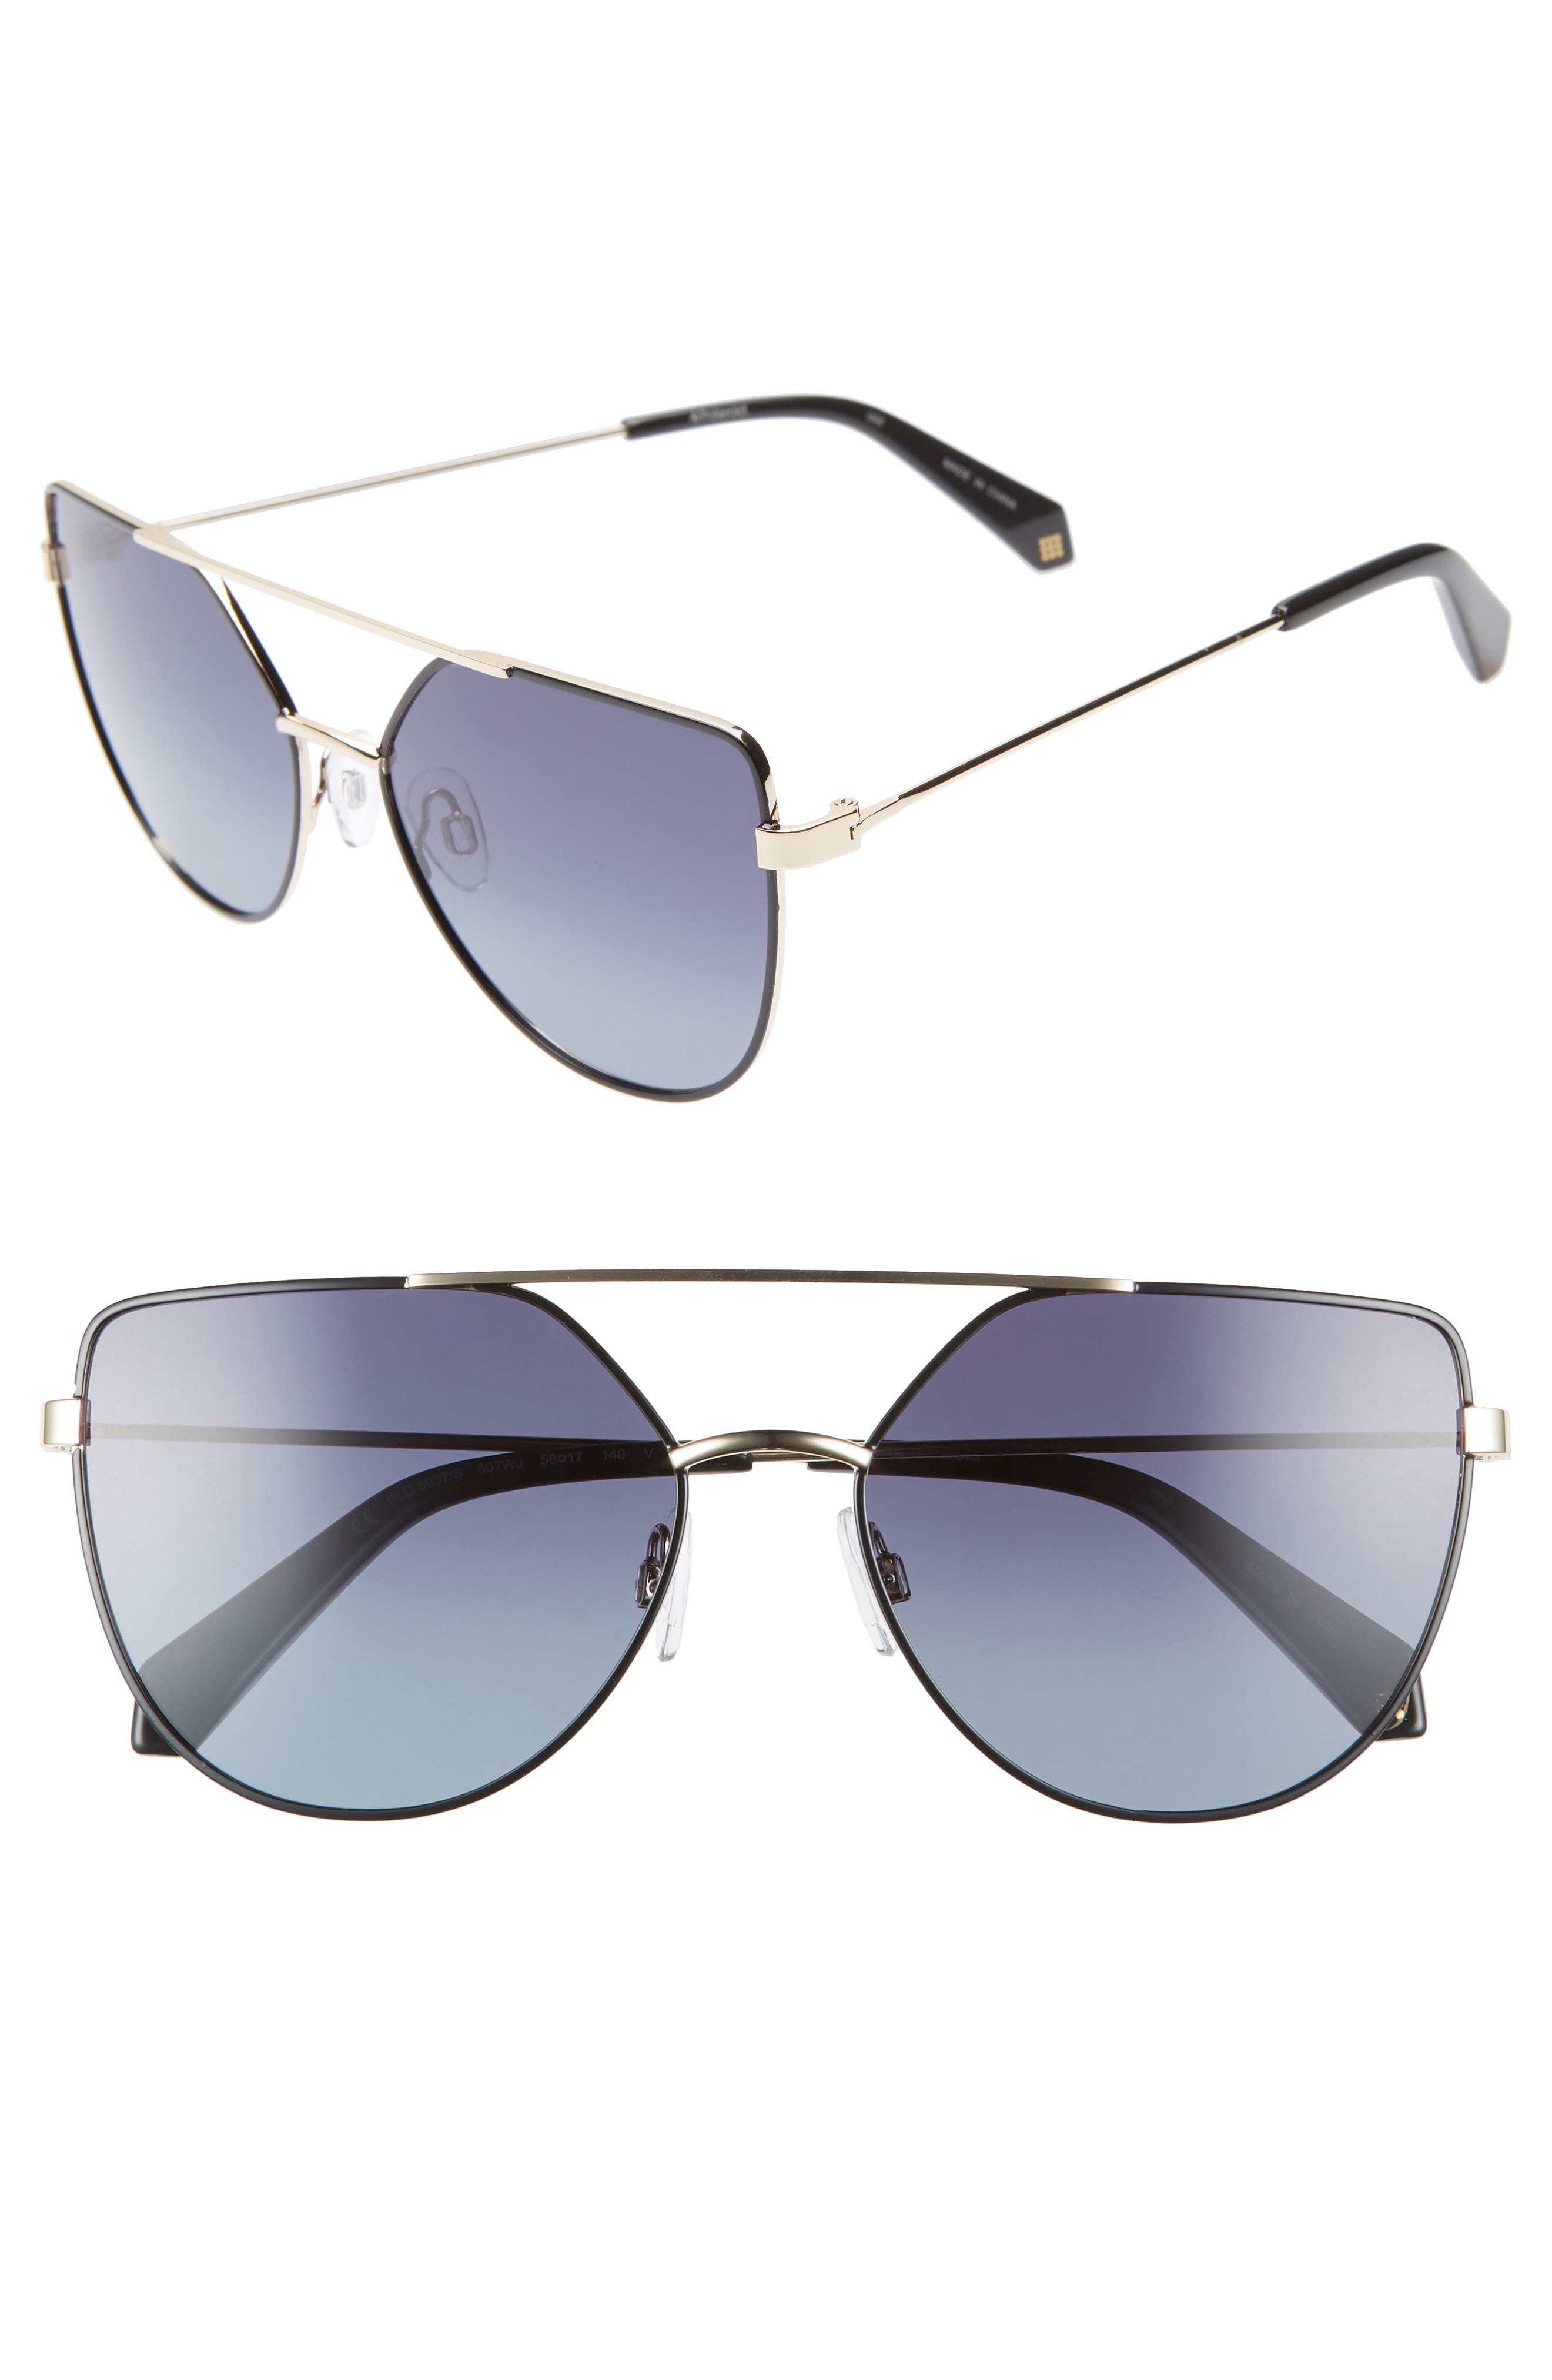 Polaroid 5m Polarized Sunglasses -